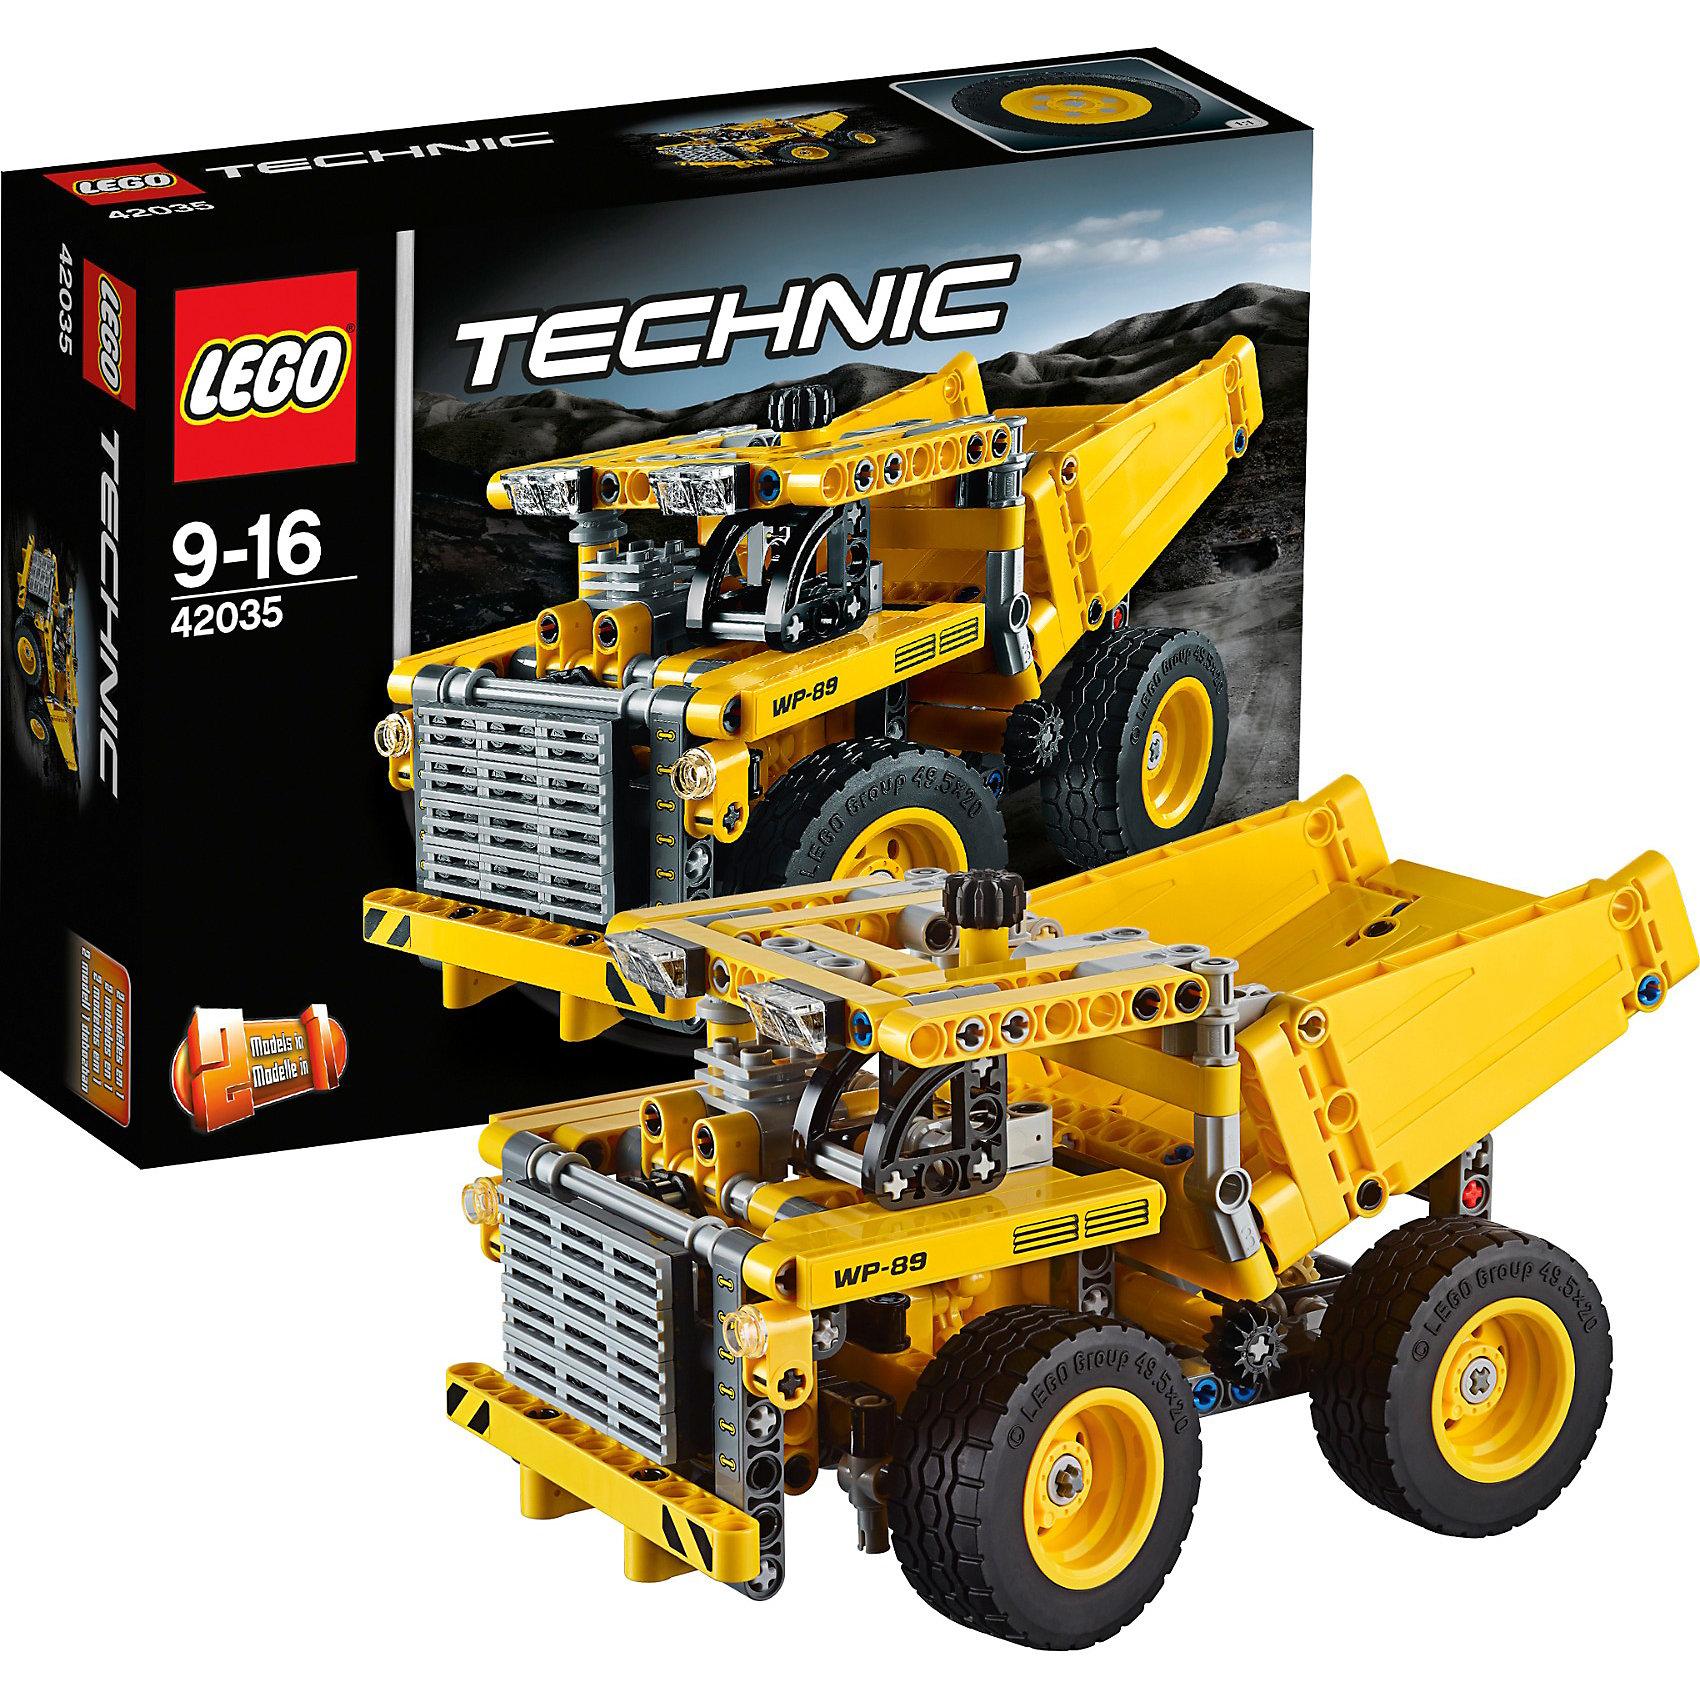 LEGO Technic 42035: Карьерный грузовик